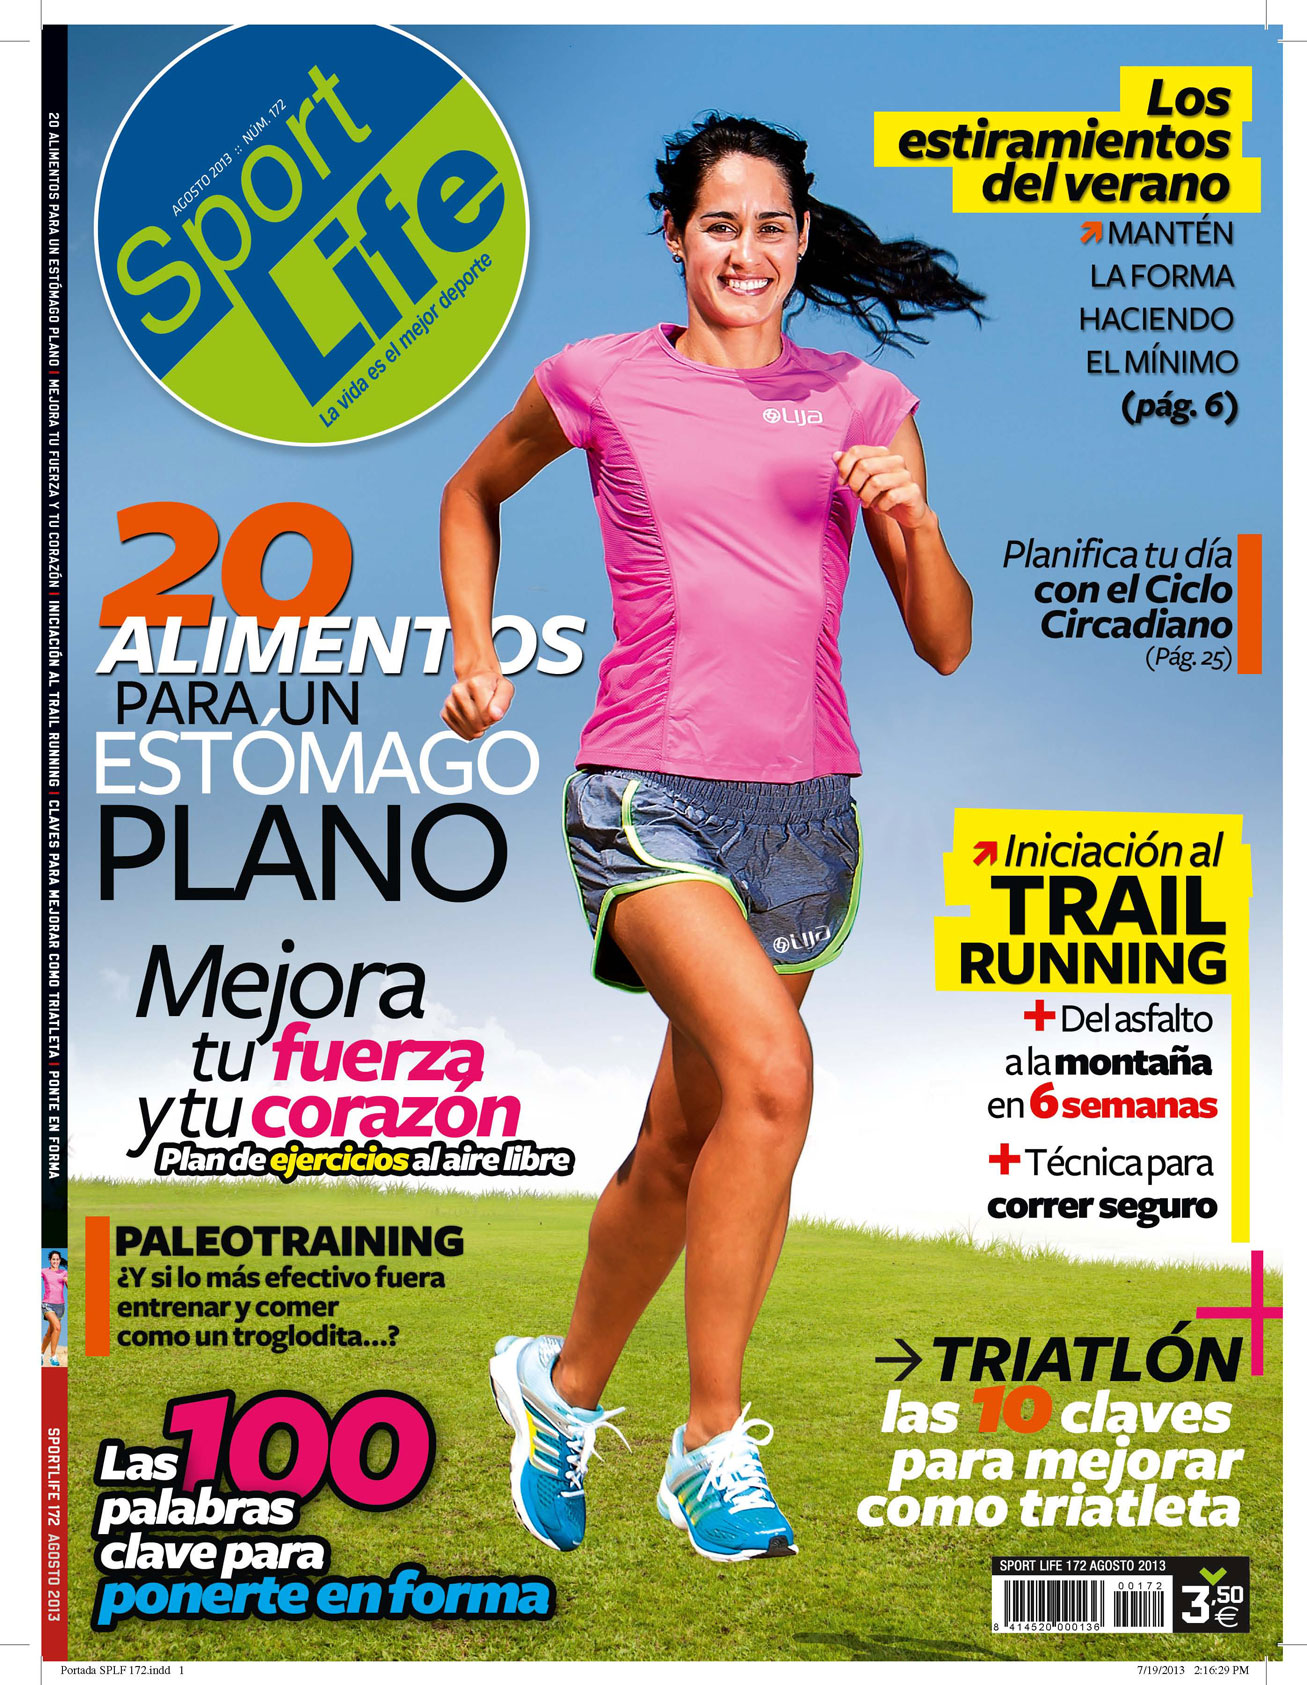 Sumario Sport Life 172 agosto 2013